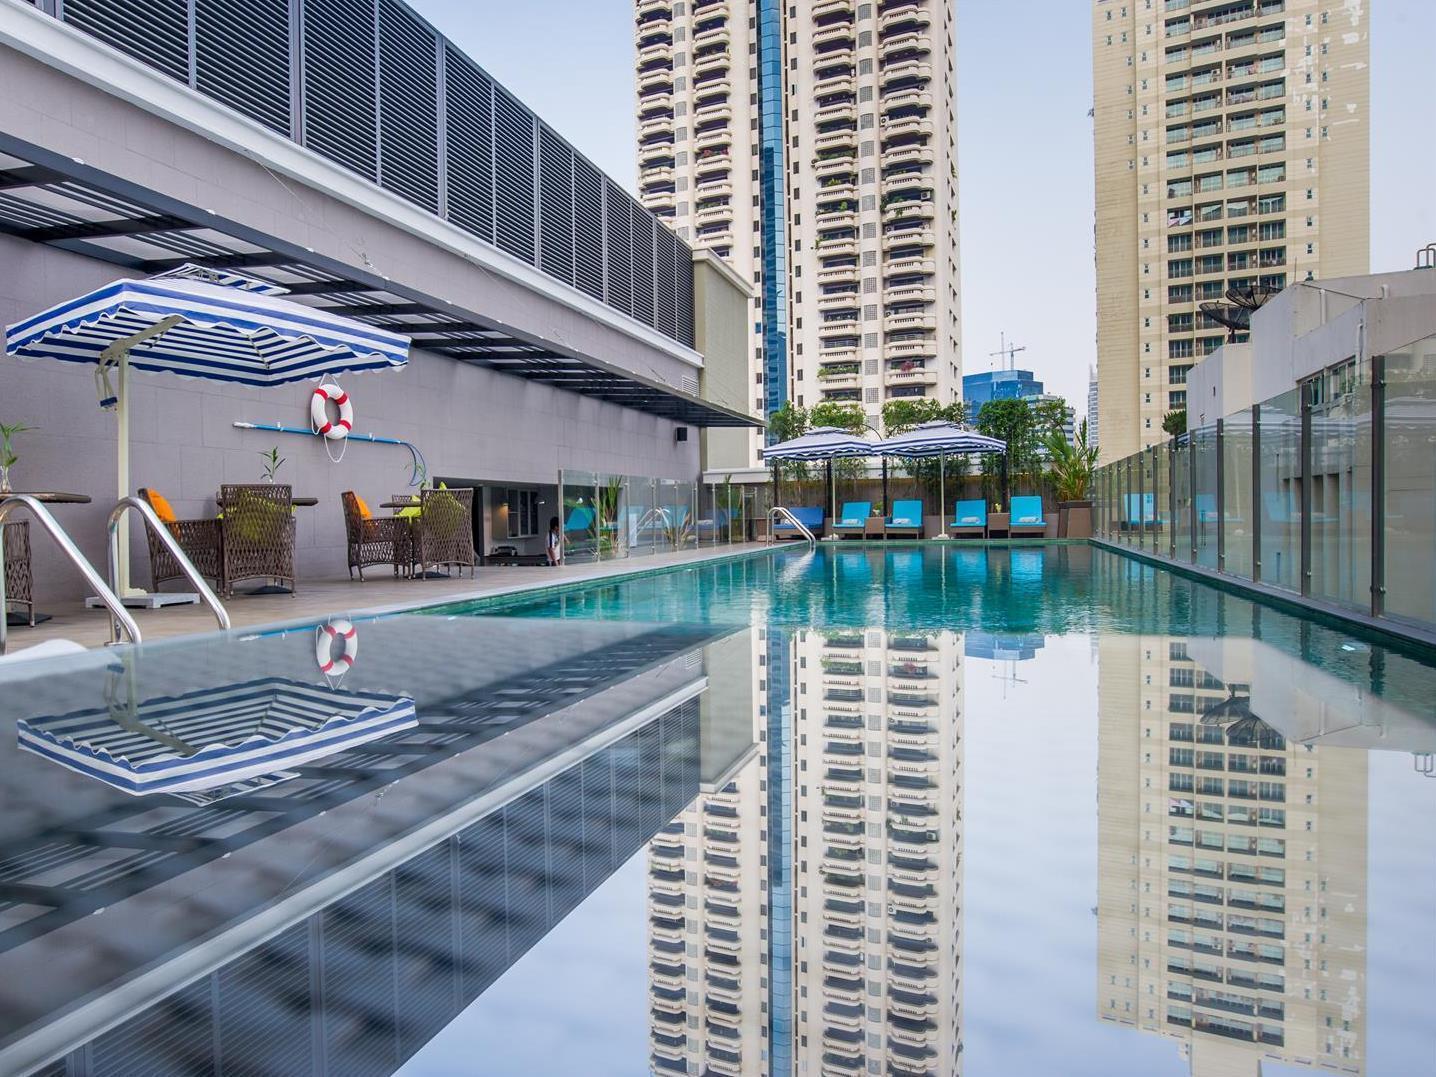 Well Hotel Bangkok Sukhumvit 20 เวลล์ โฮเต็ล แบงค็อก สุขุมวิท 20